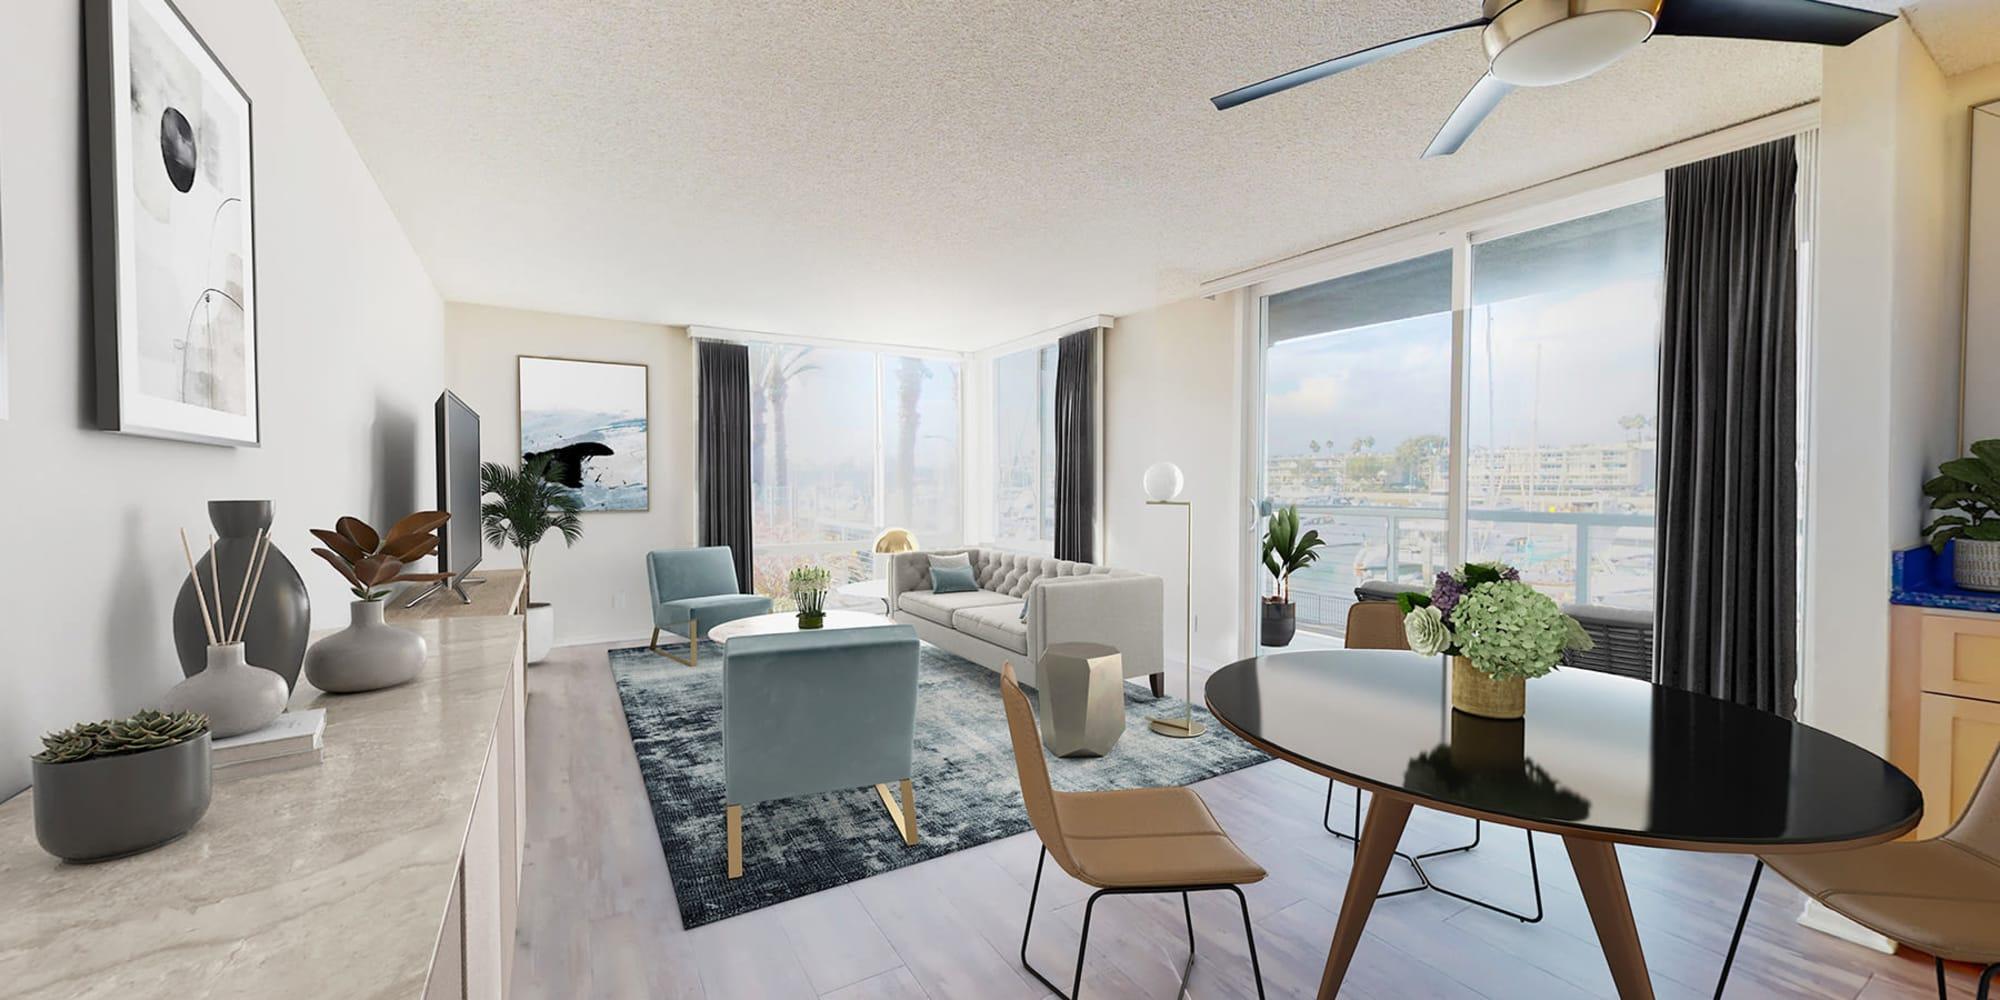 spacious living space with balcony and views of the marina at Waters Edge at Marina Harbor in Marina Del Rey, California